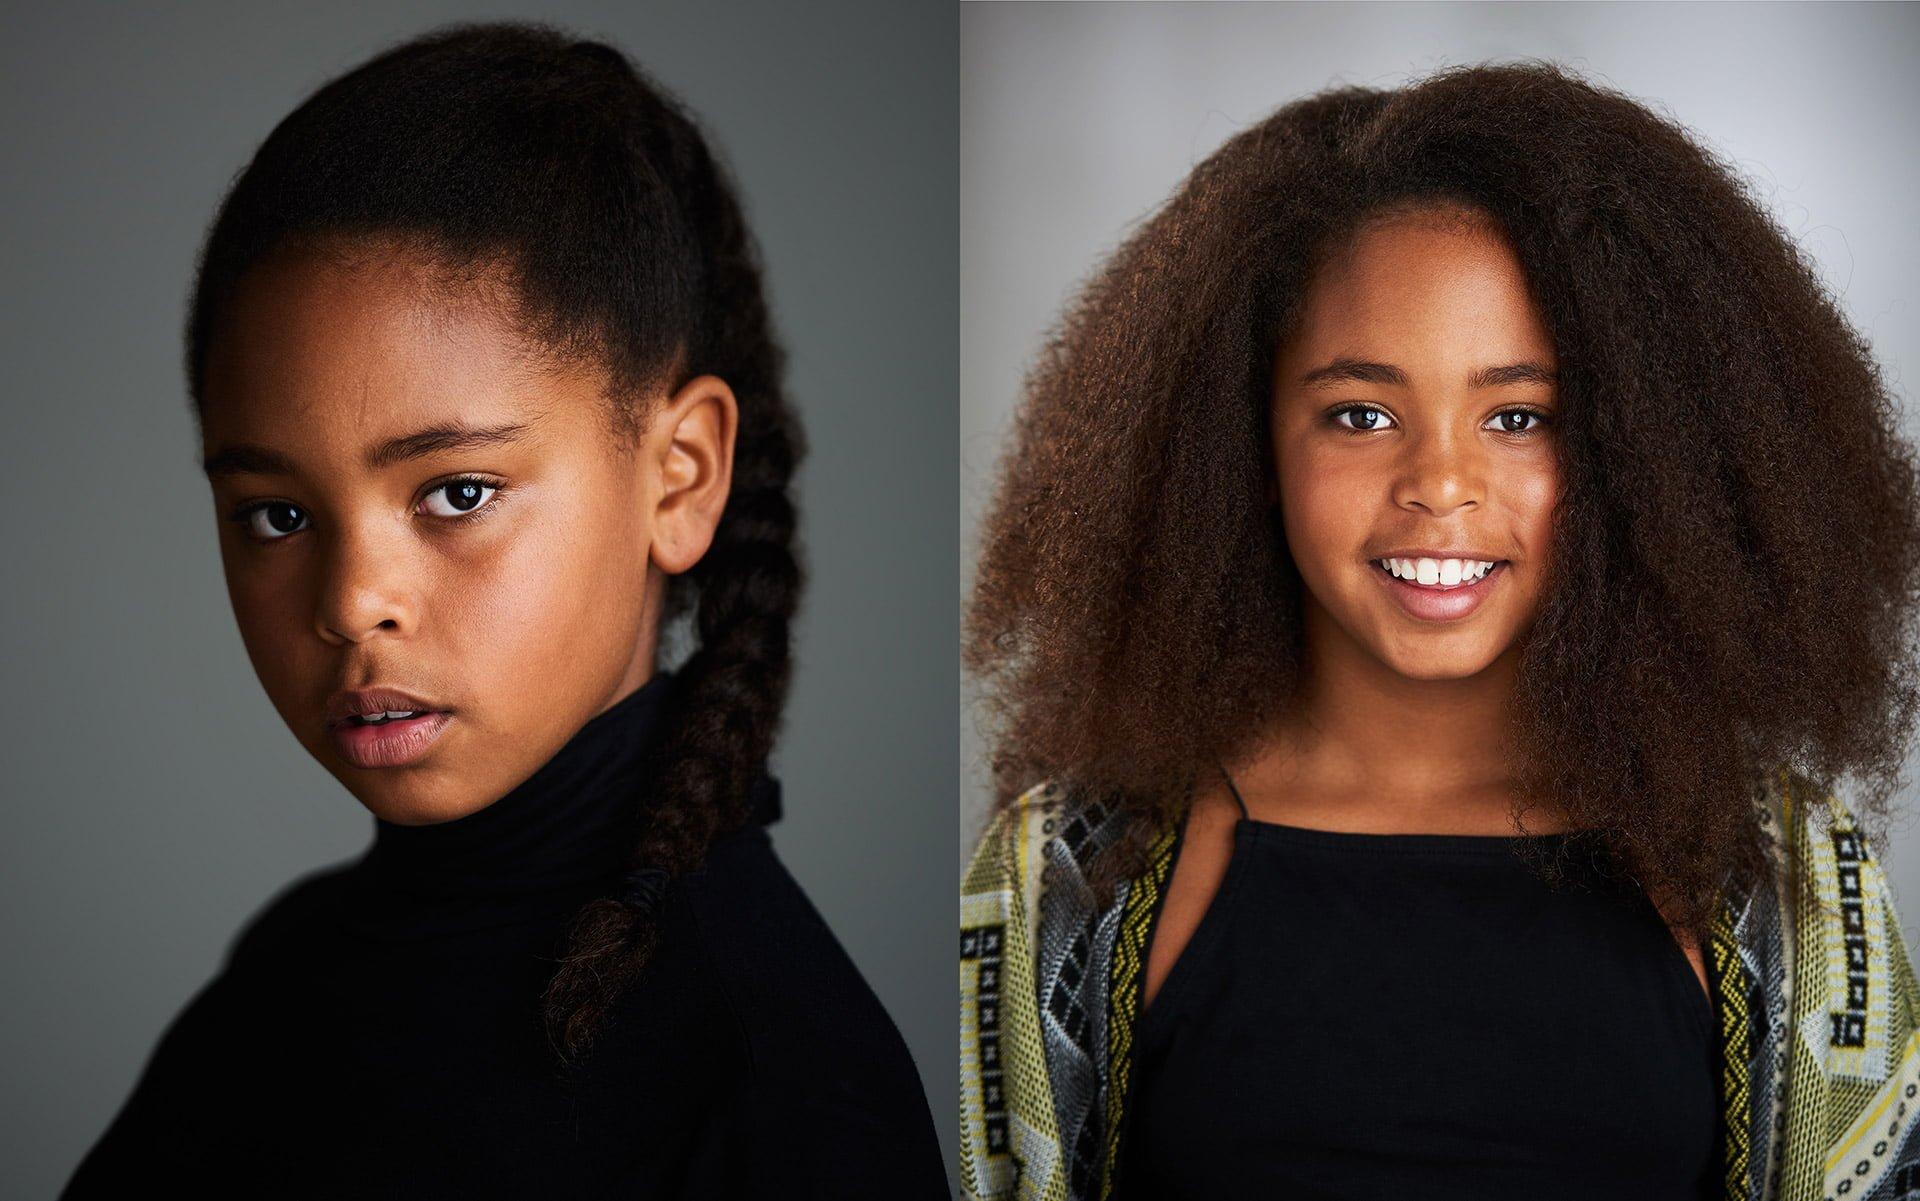 child-actor-headshots-brighton-olivia